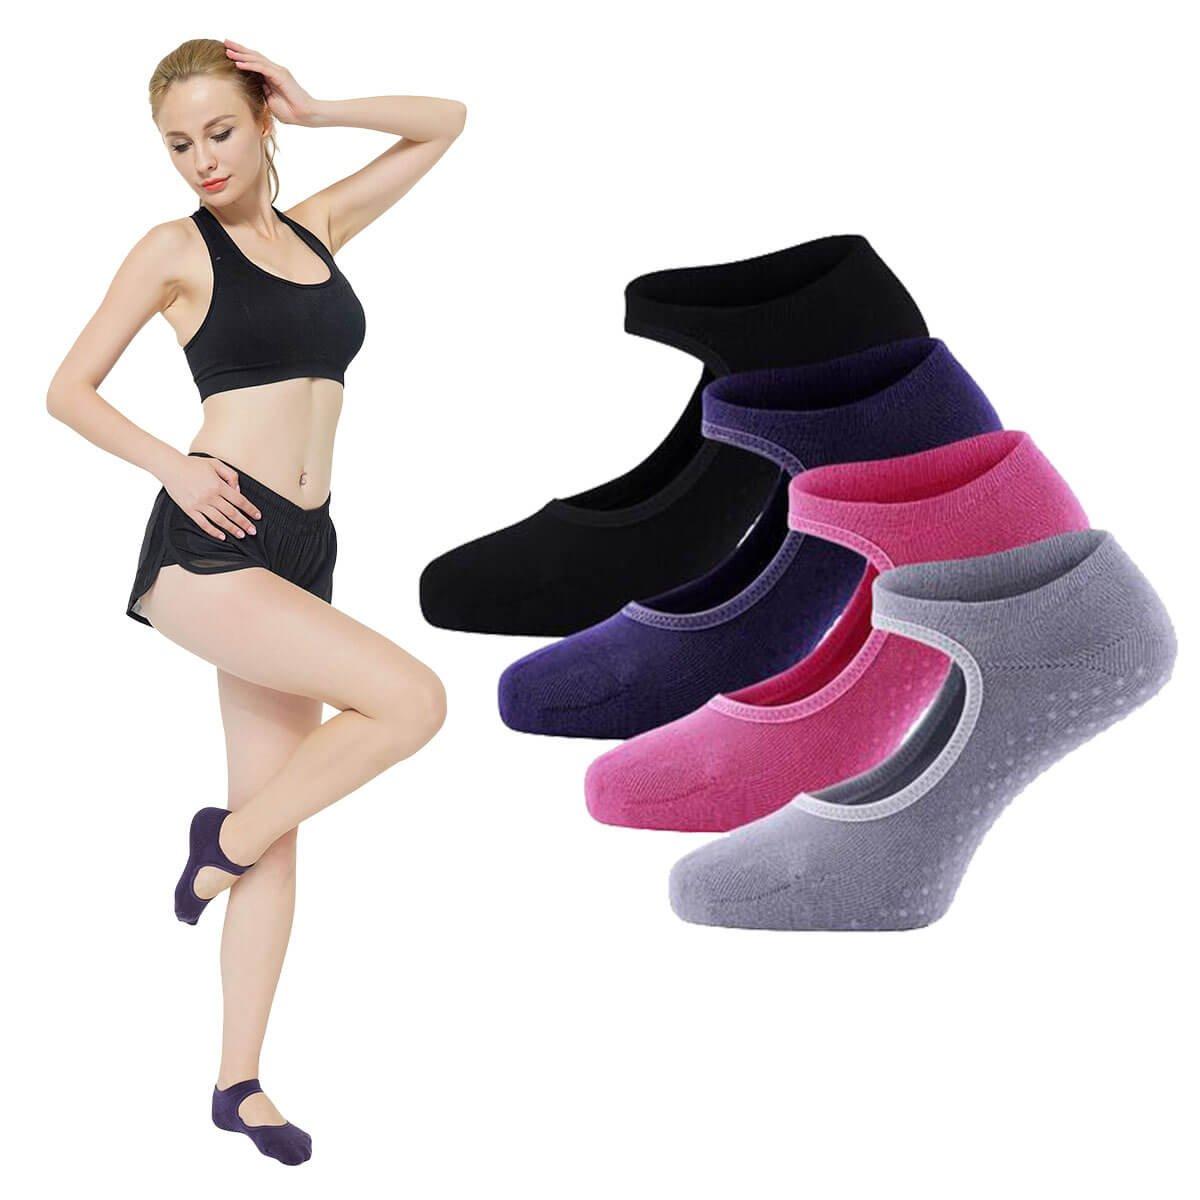 LIBRUONE Yoga Barre Socks Non Slip Skid for Barre Pilates Ballet 4 Pairs Cotton Socks One Size 5 10 …